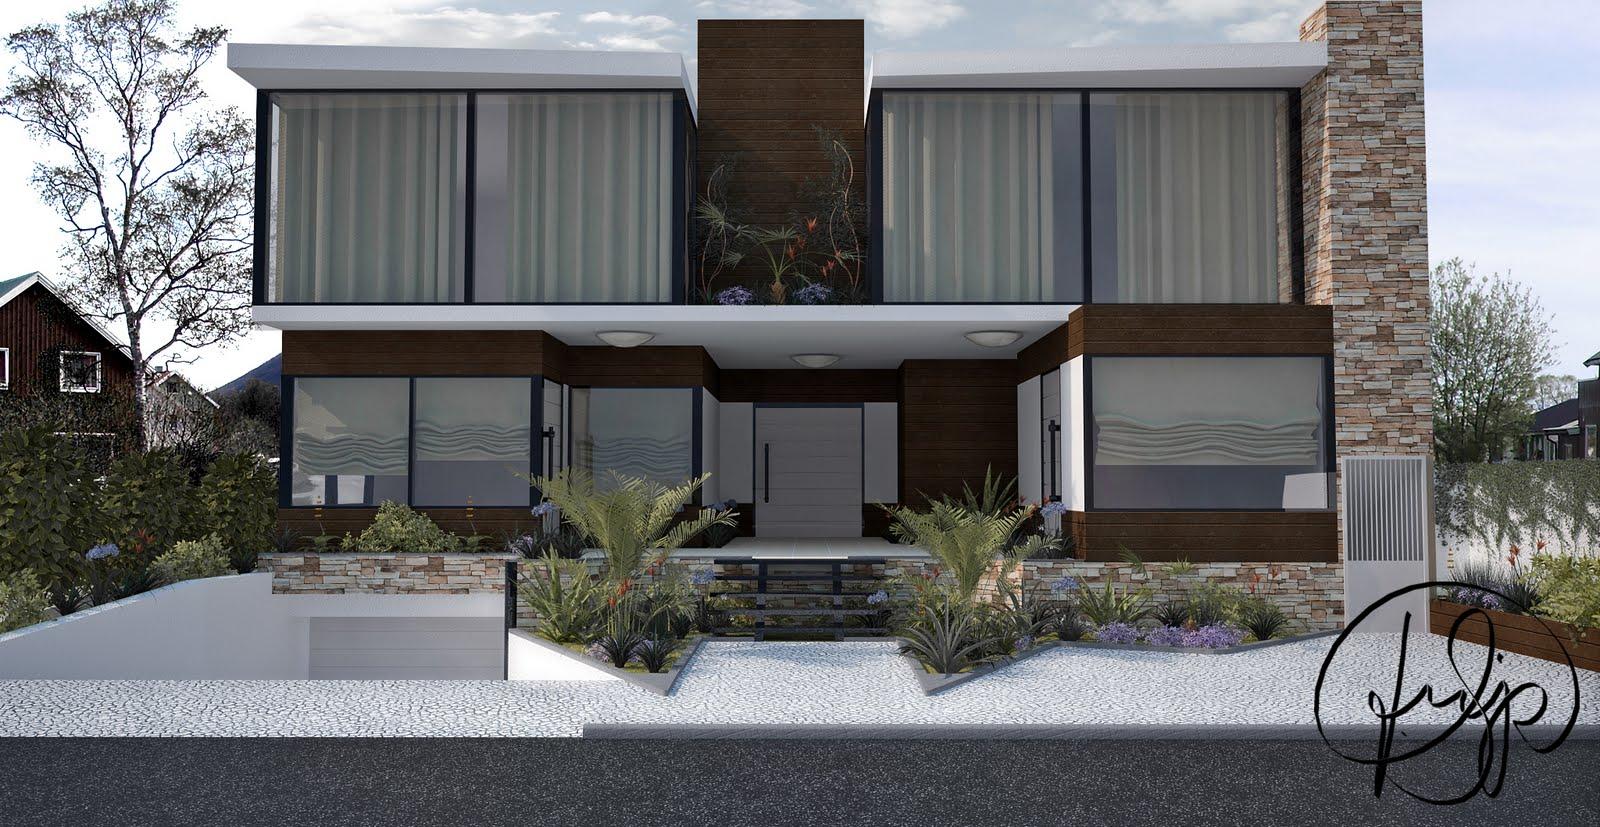 Para casa en pinterest arquitetura arquitectos y casas - Arquitectos casas modernas ...